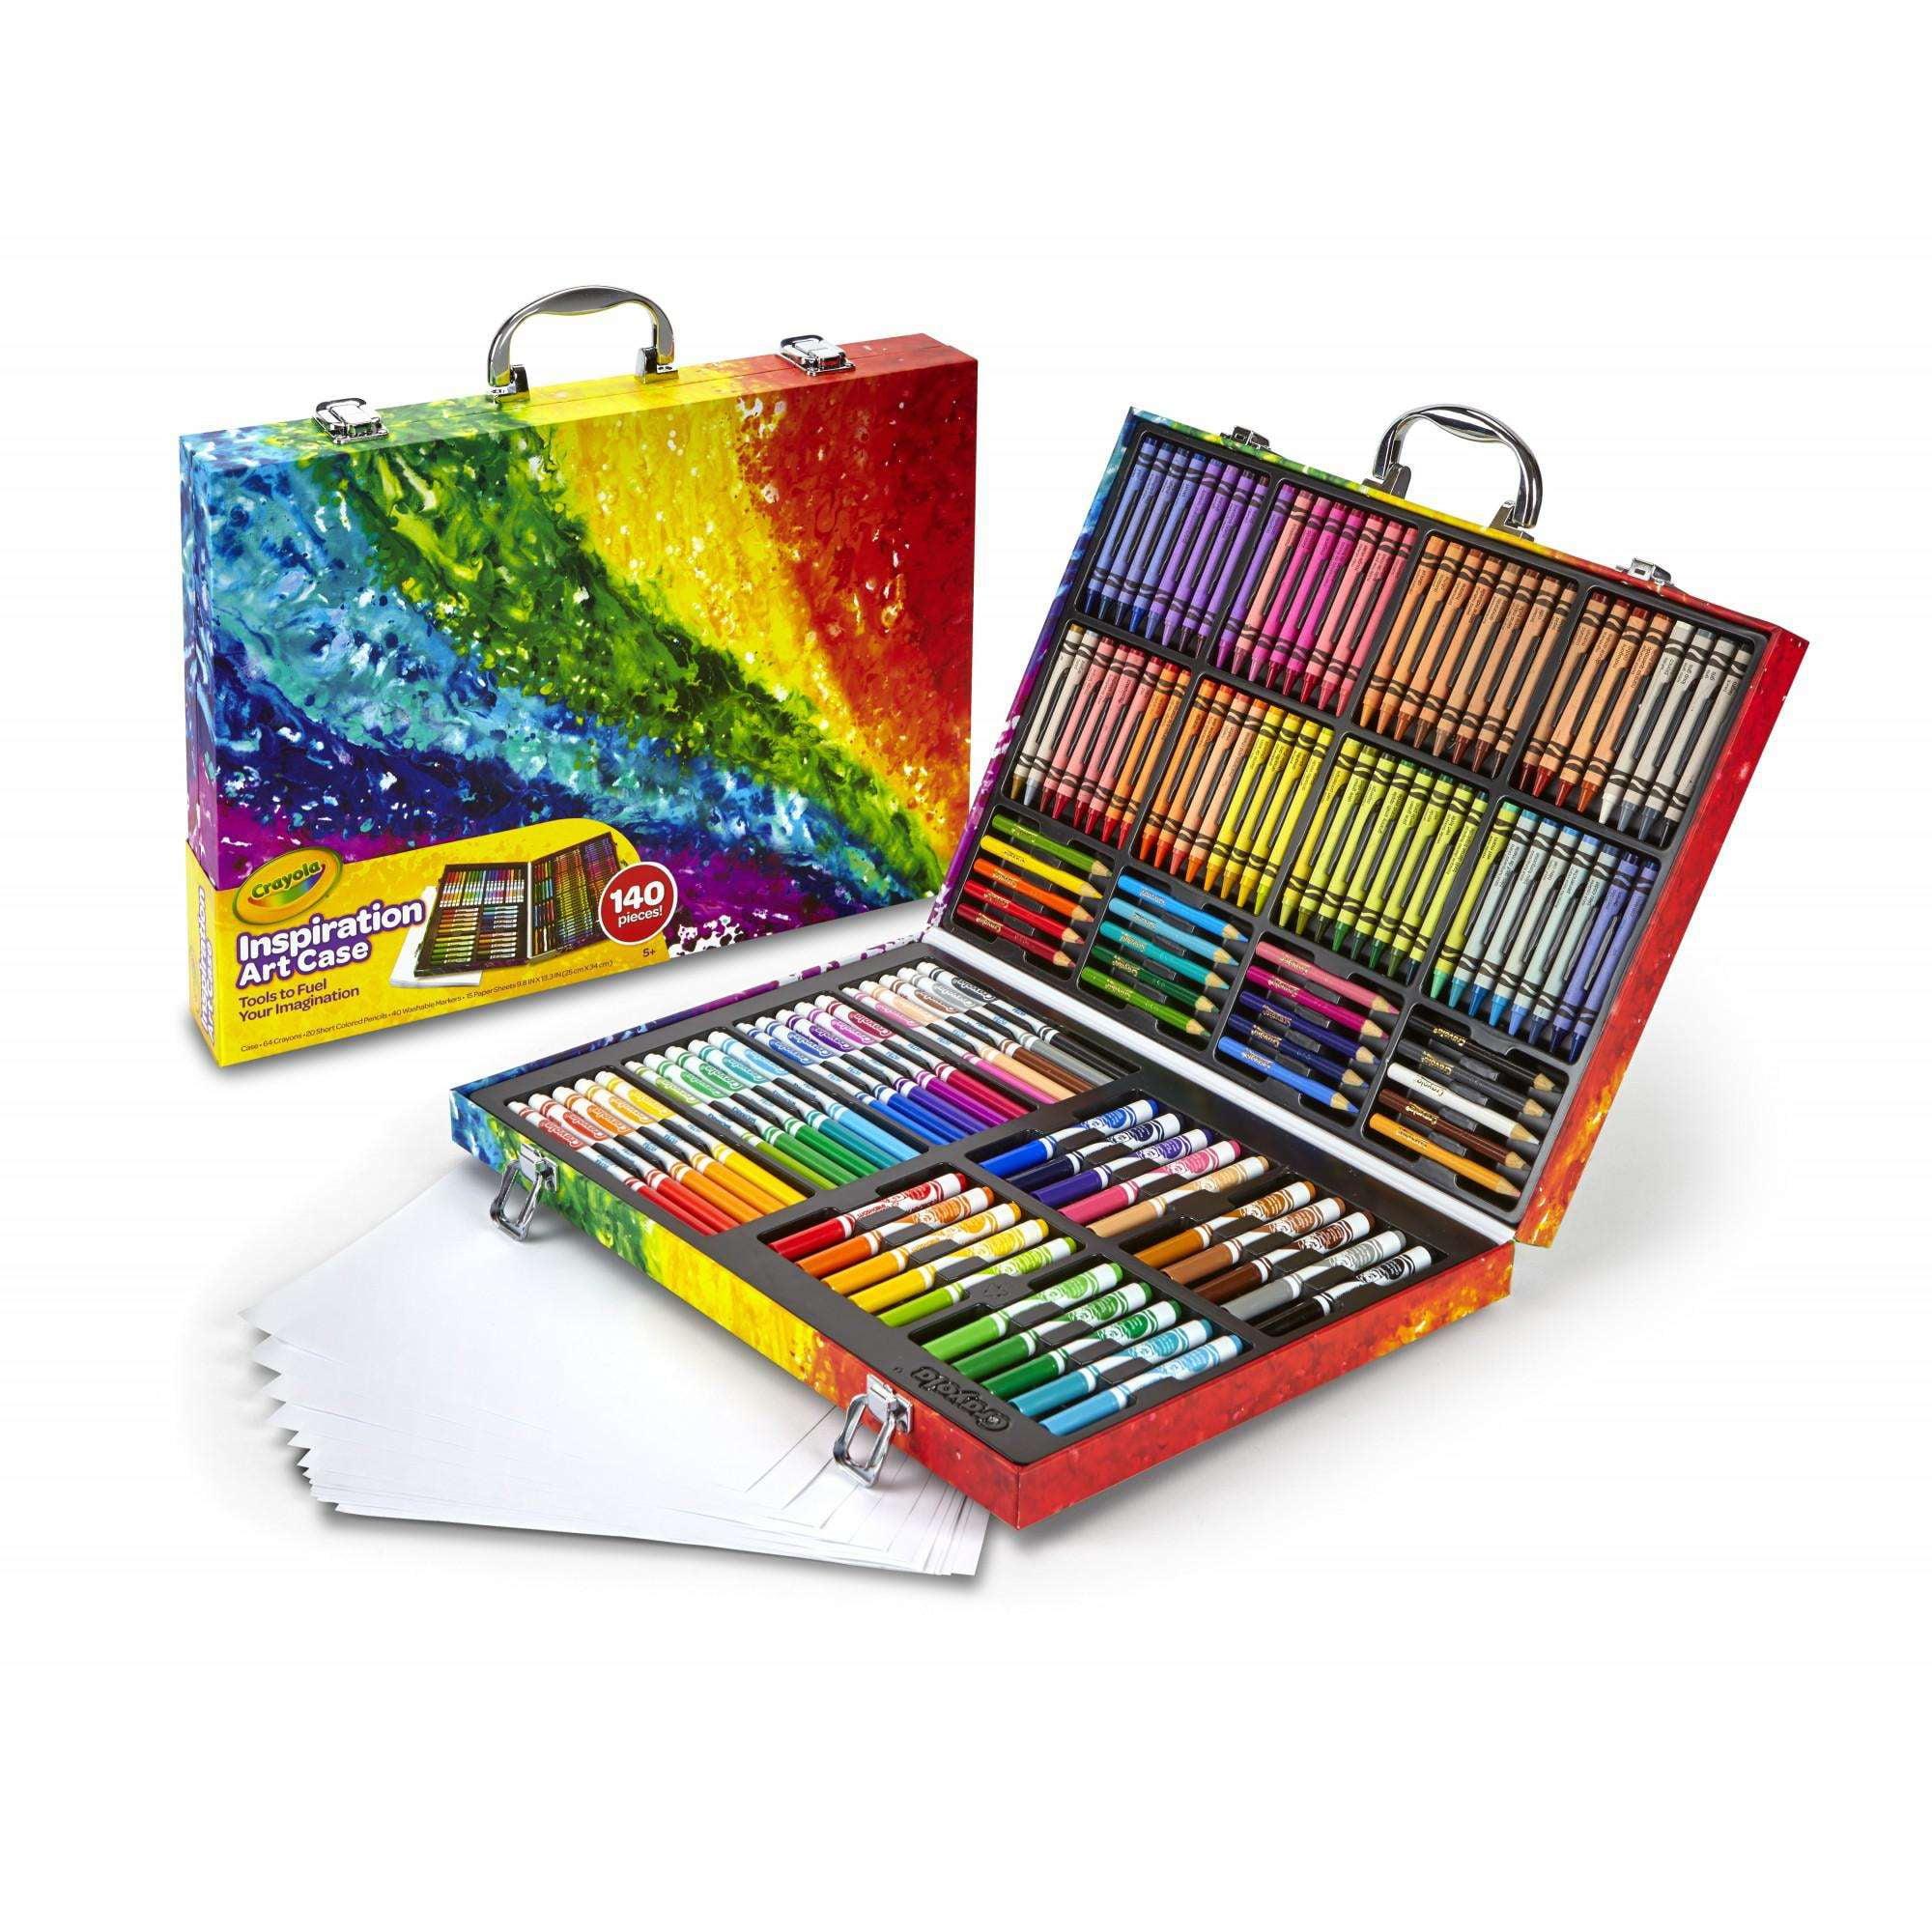 Crayola Inspiration Art Case, 140 Piece Art Set, Ages 3+